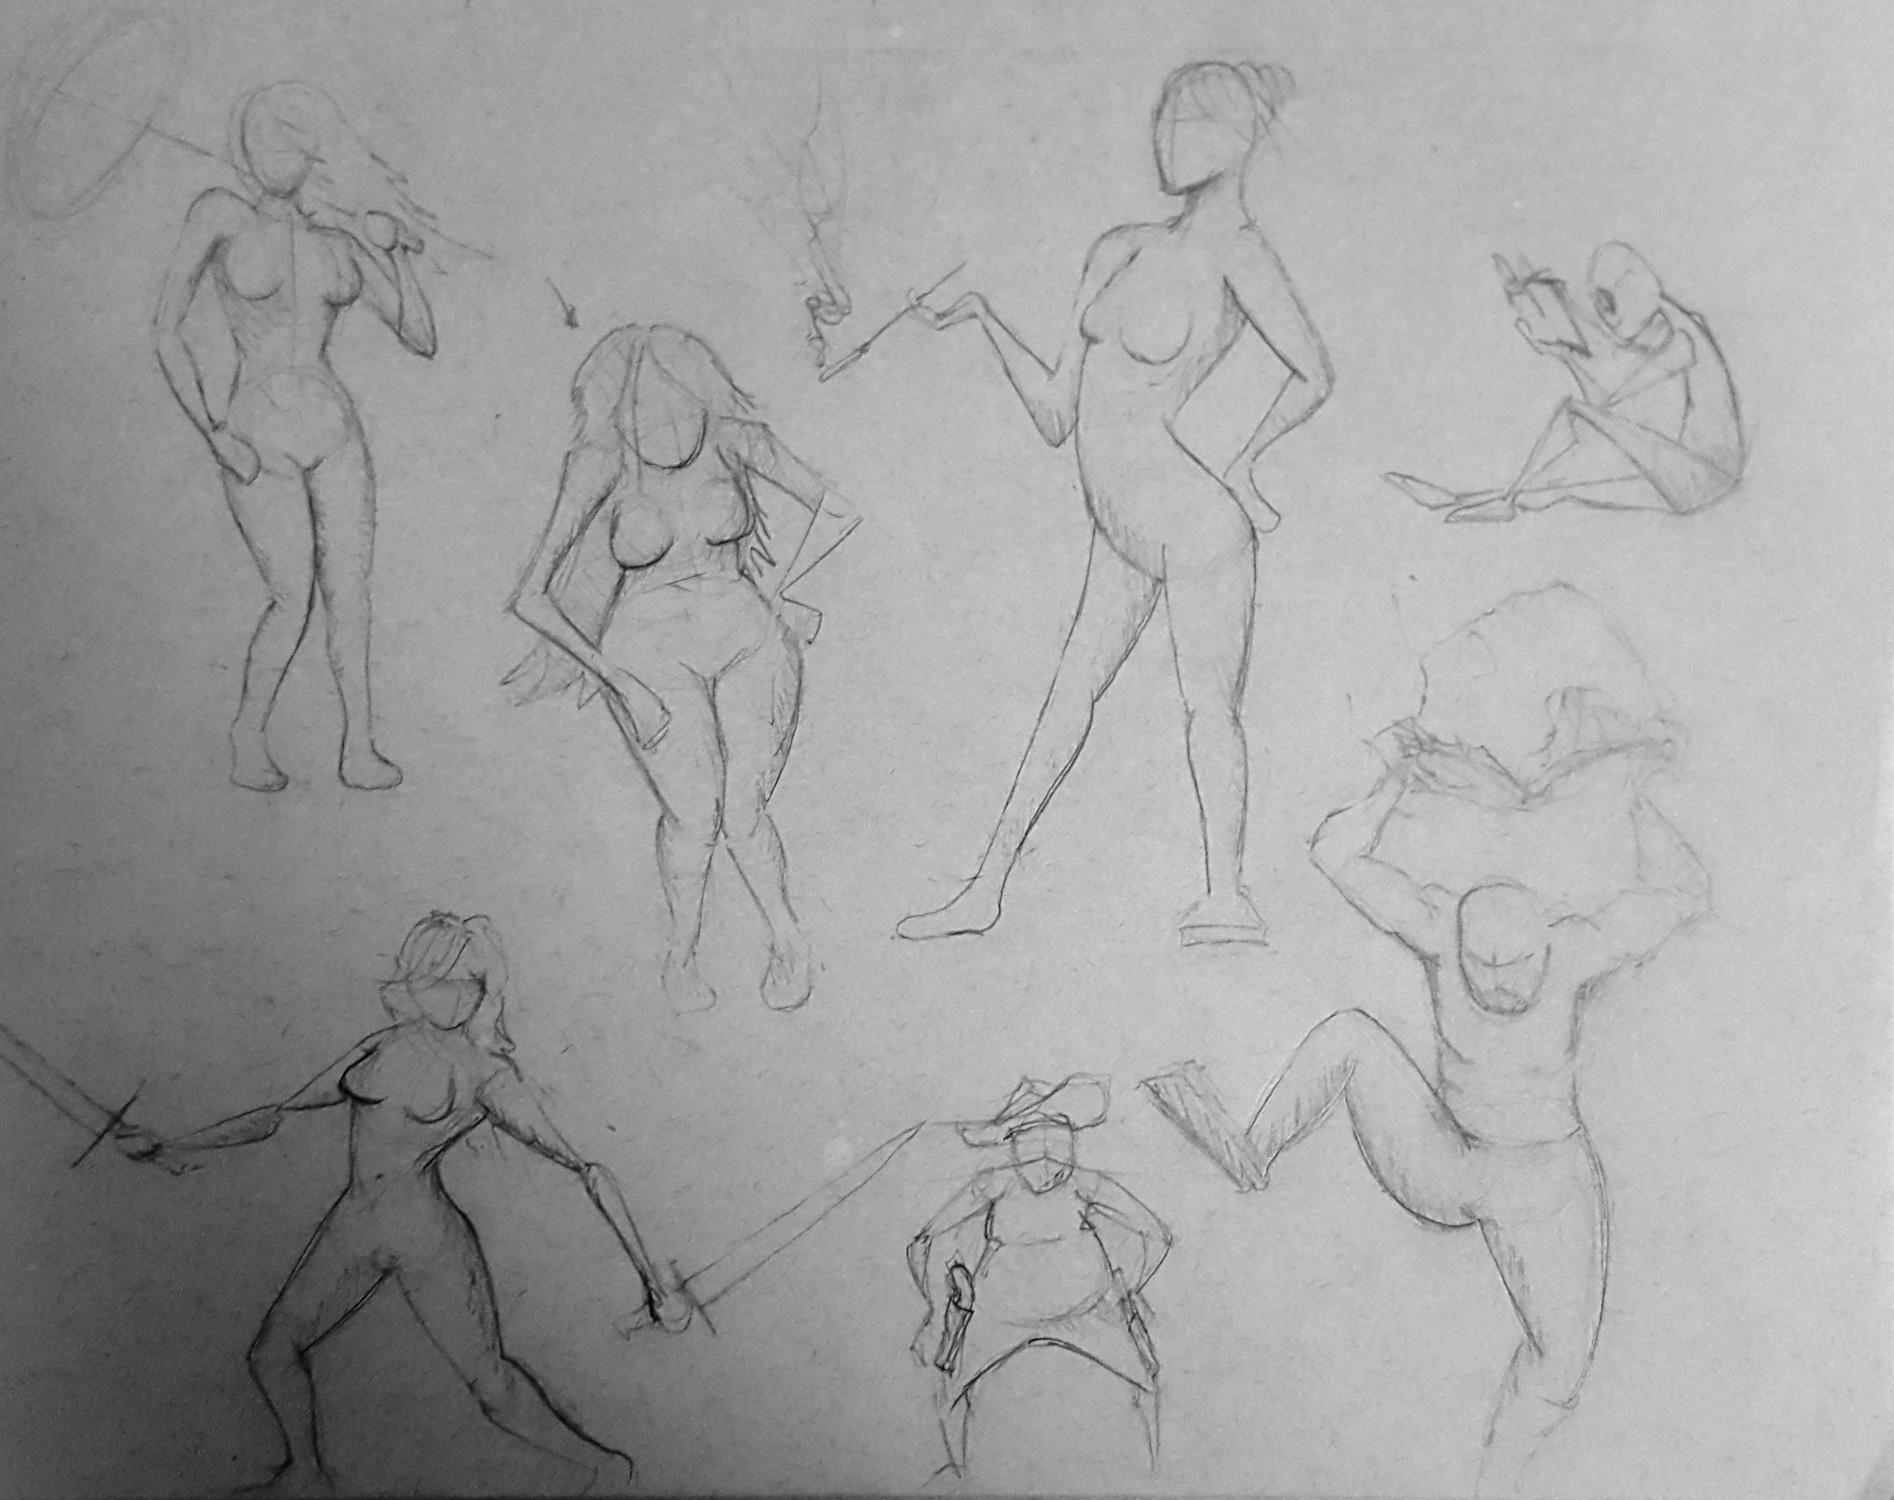 ArtStation - Five minute Gestures, Billy Monfort